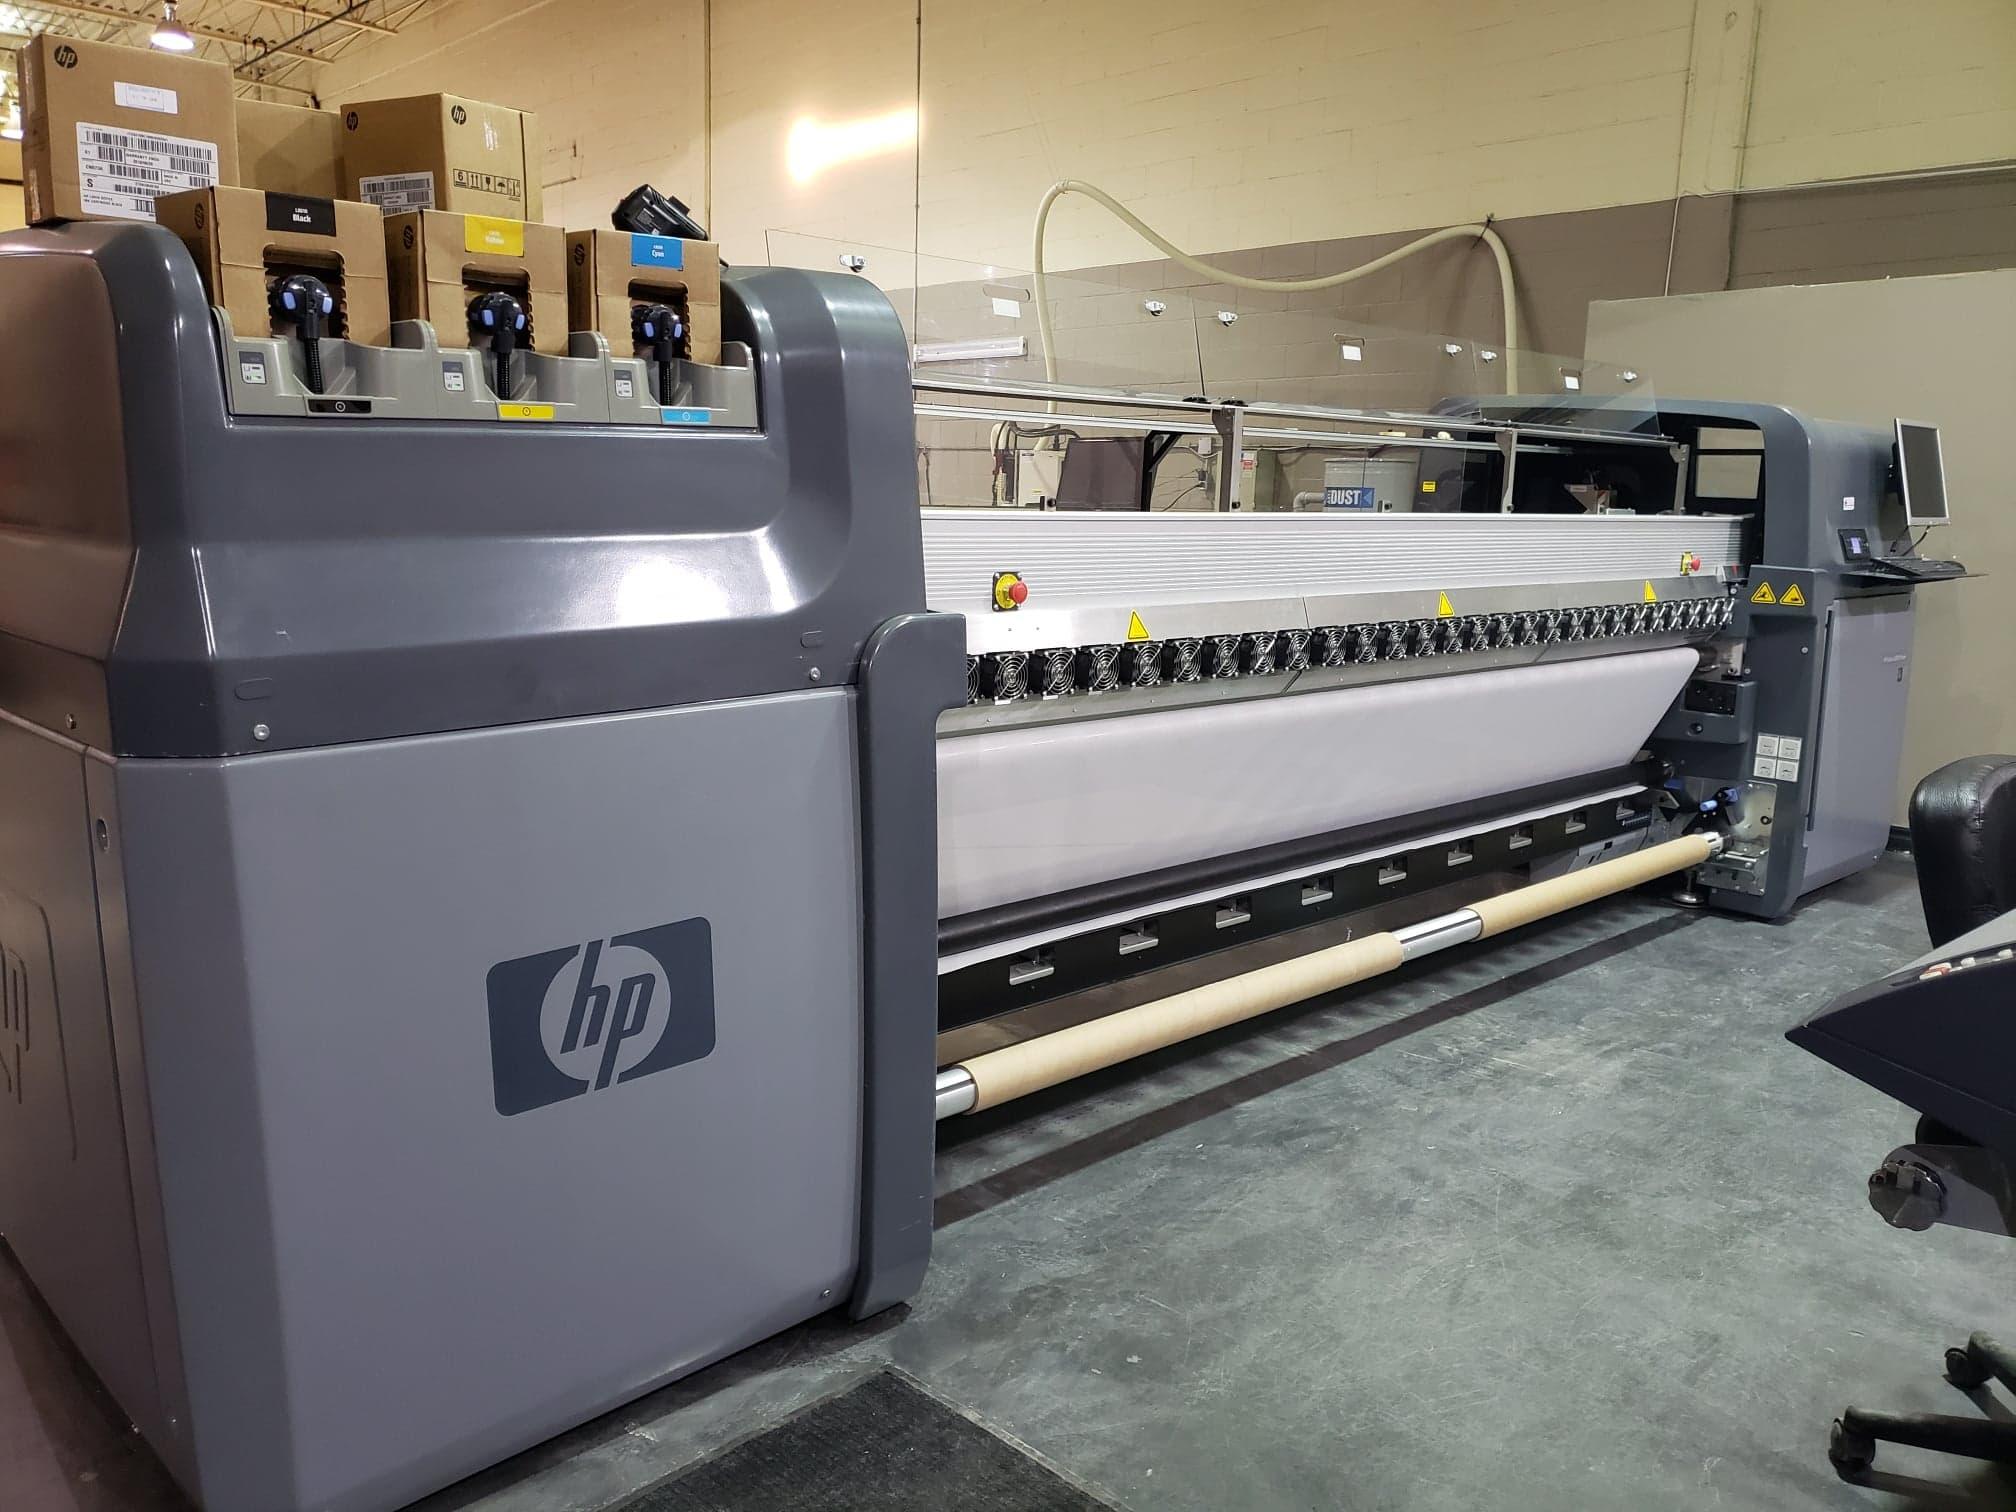 HP Lx850 - Low Usage Print Like Brand New